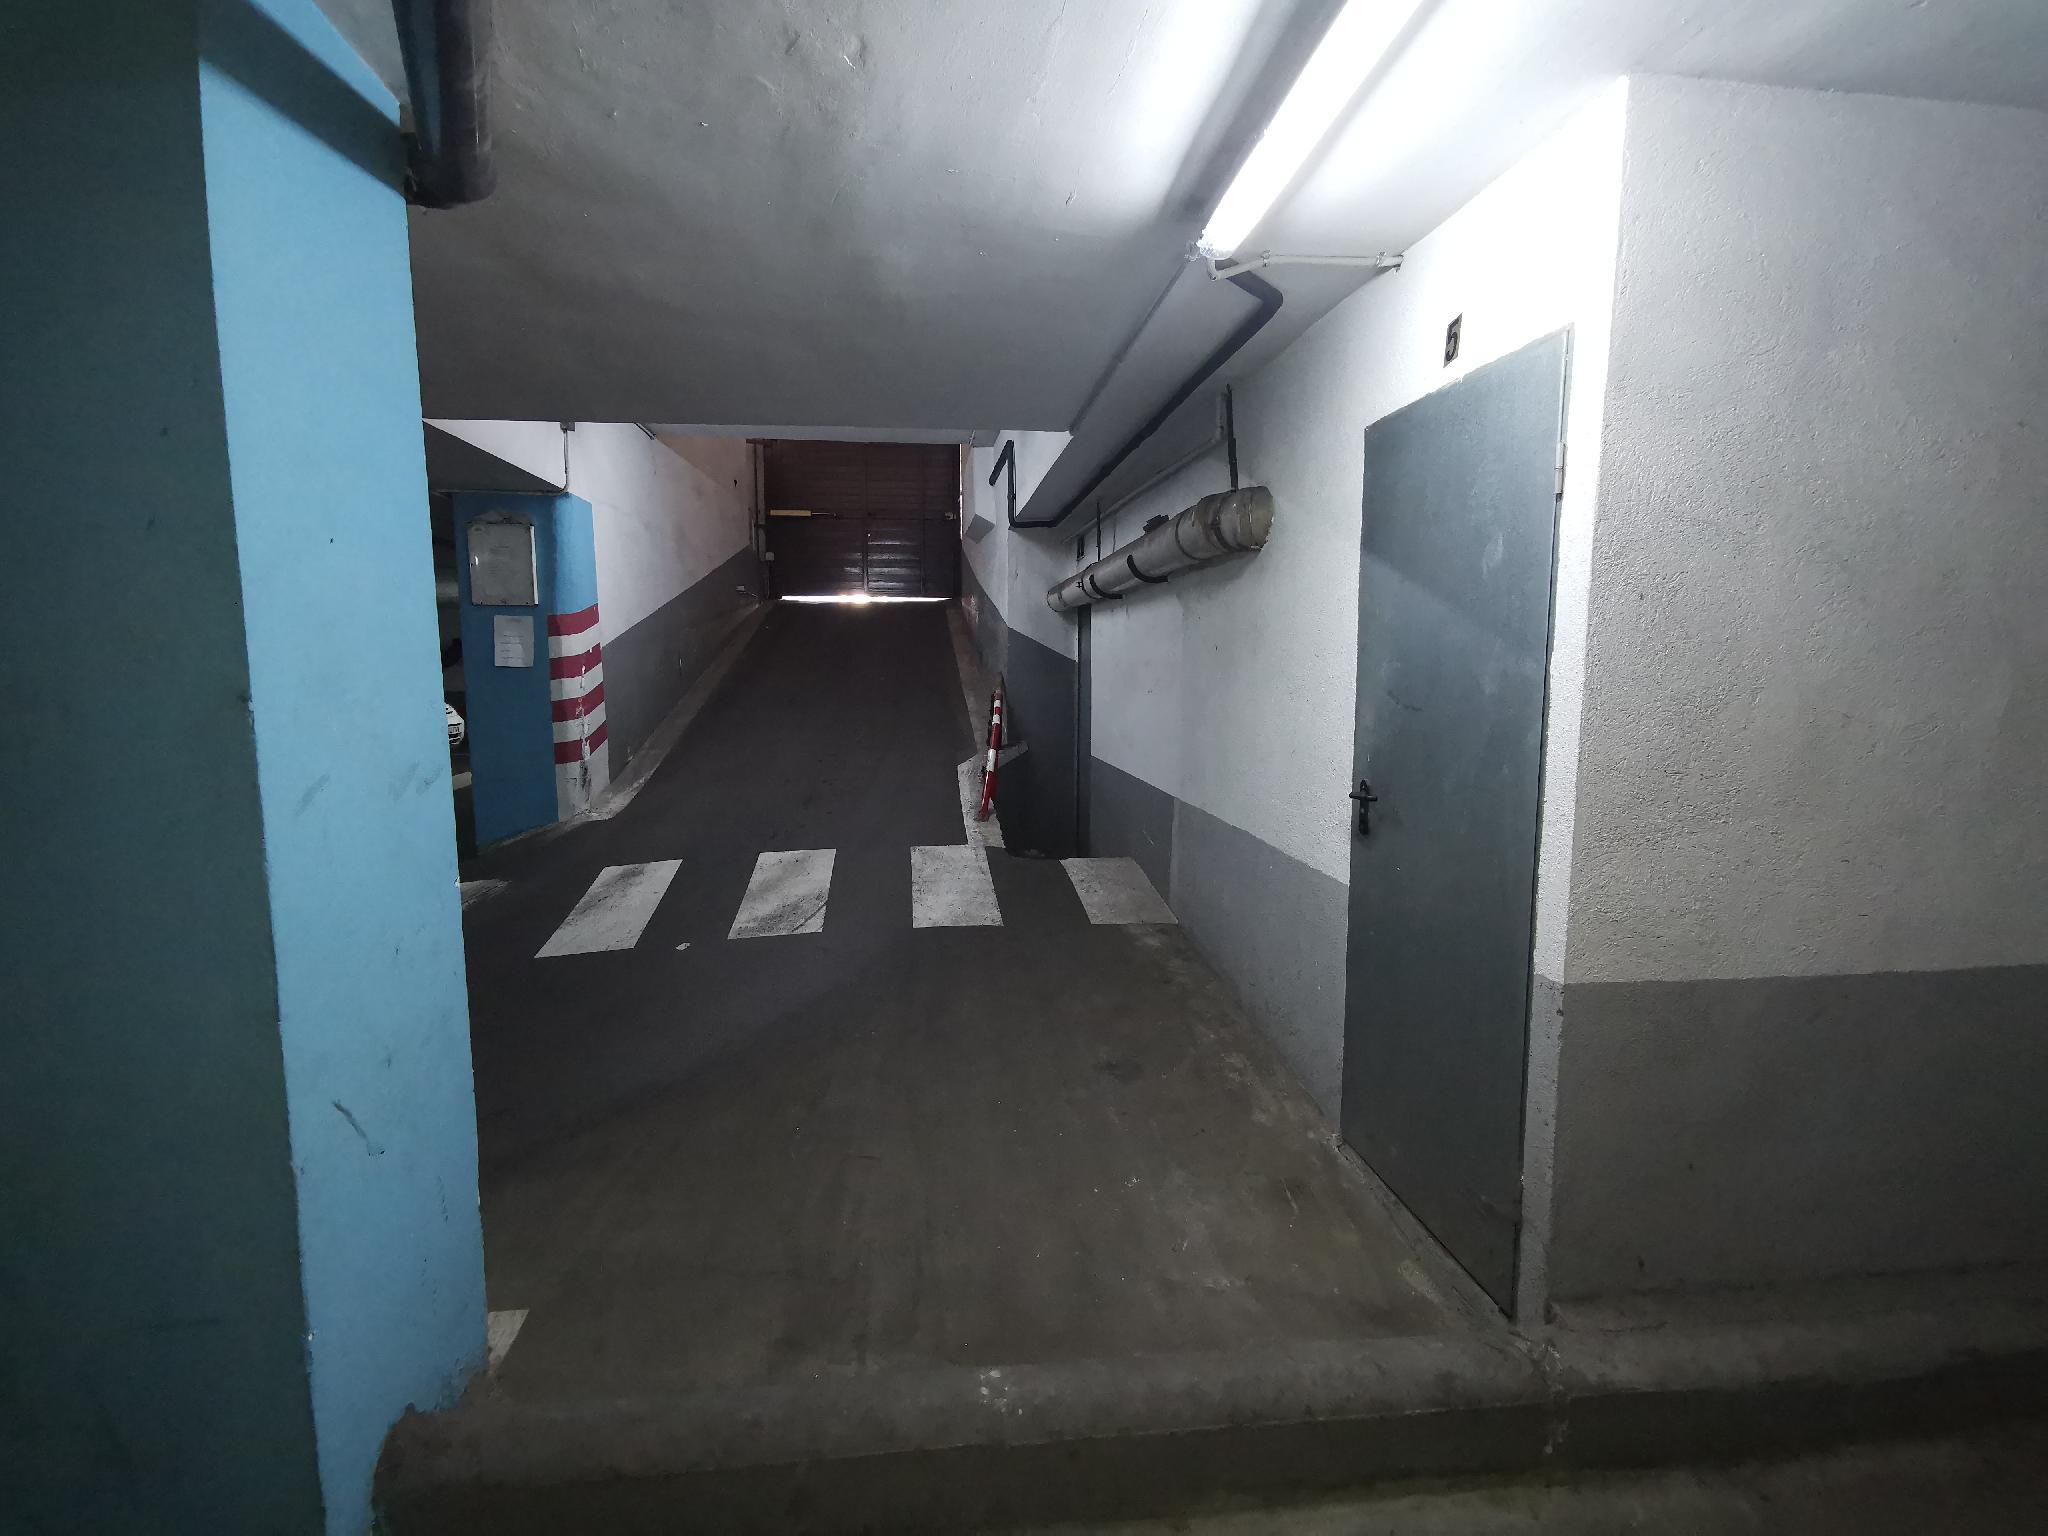 228451 - Plaza pep ventura